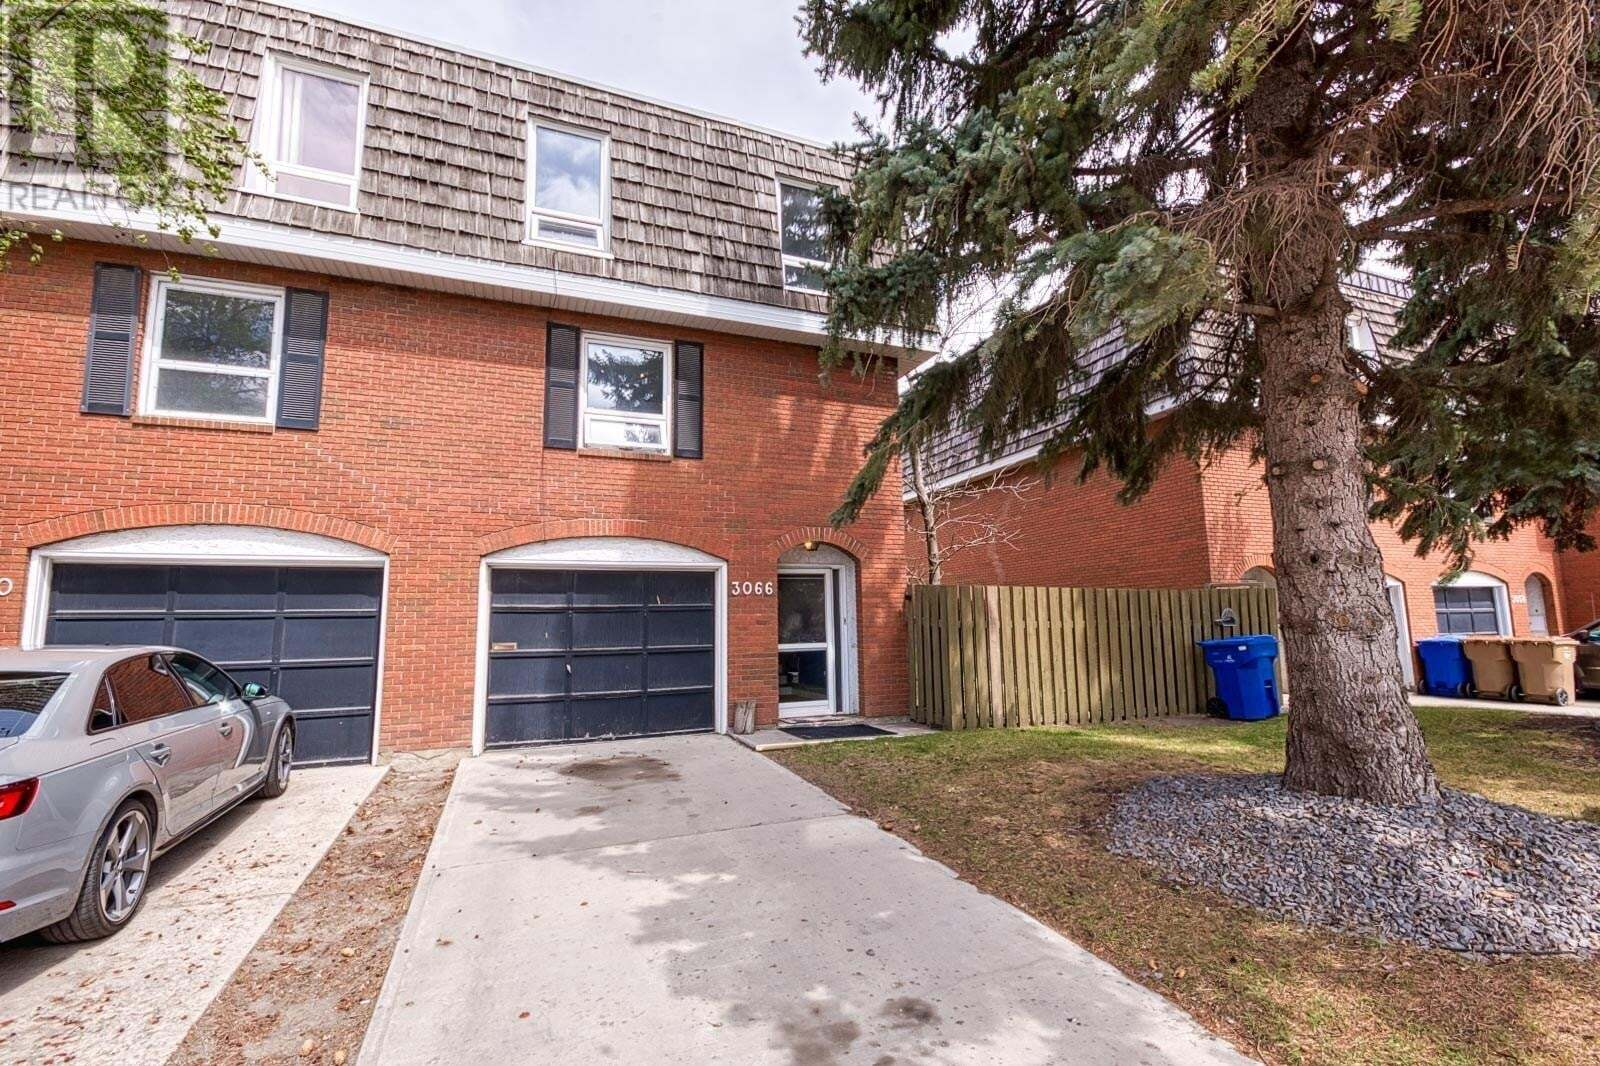 Townhouse for sale at 3066 Gordon Rd Regina Saskatchewan - MLS: SK809418